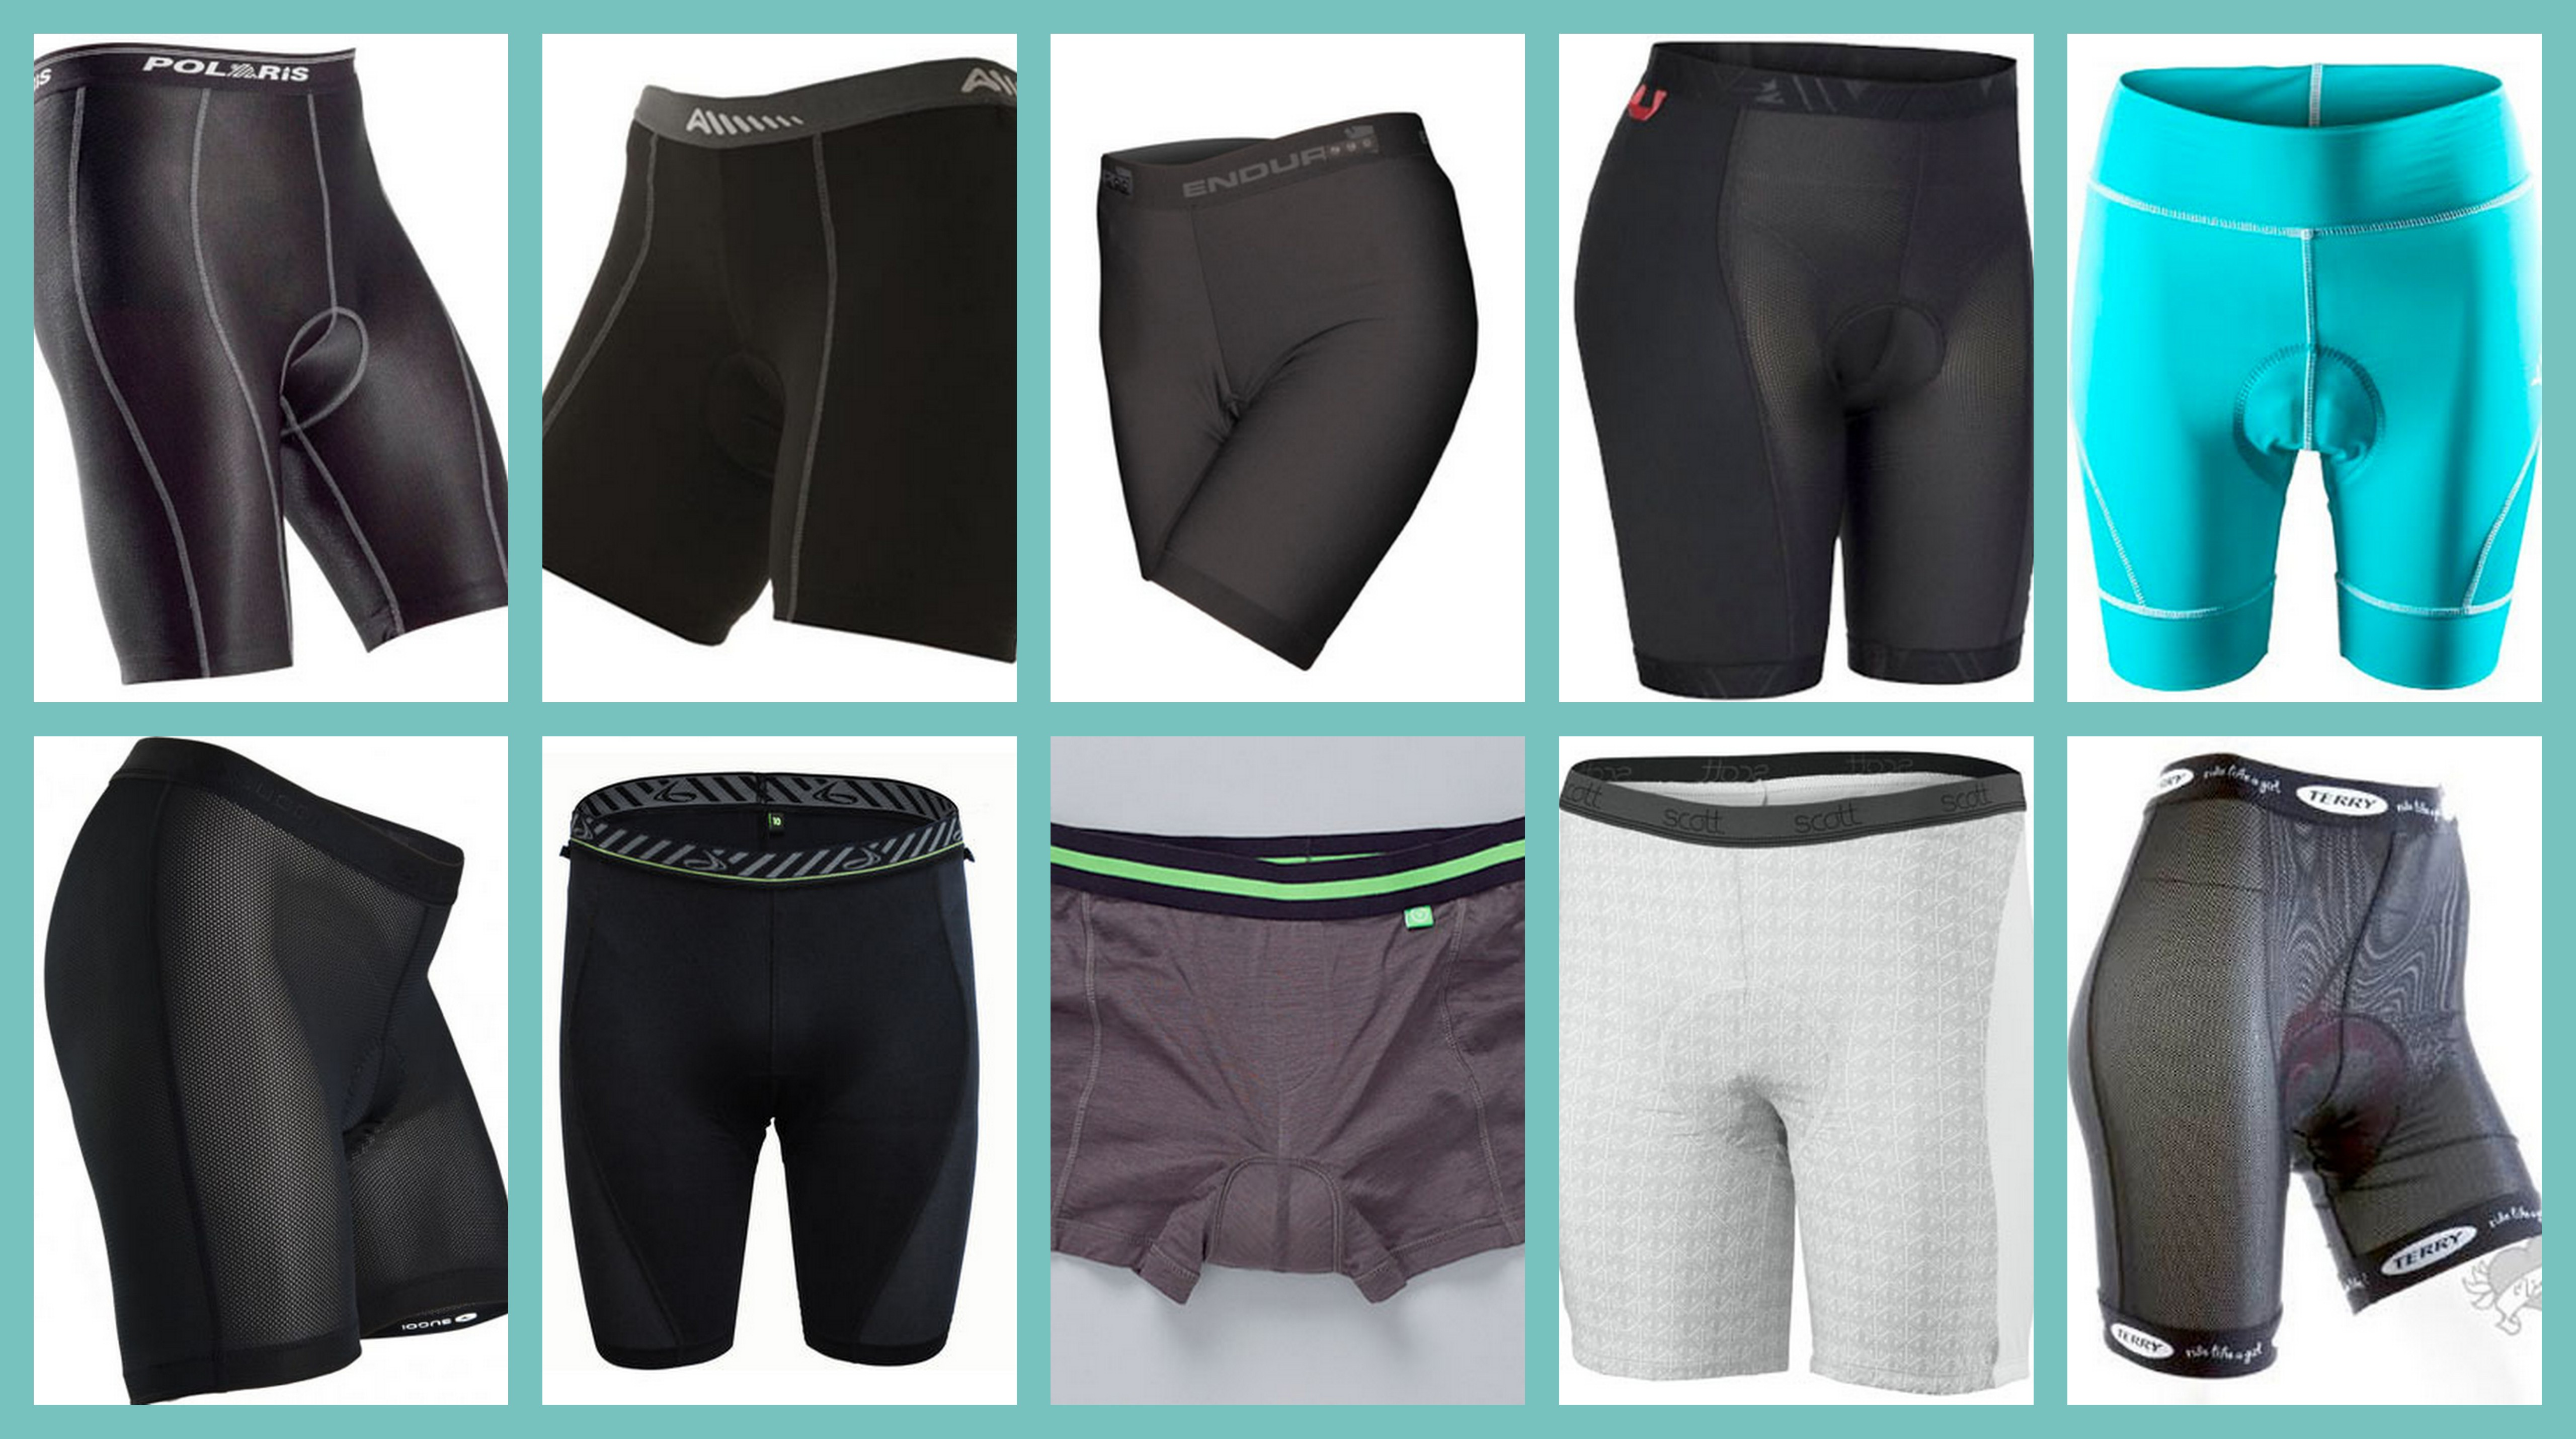 Womens Padded Cycling Running Liner Shorts Bicycle Bike Shorts Underwear Pants